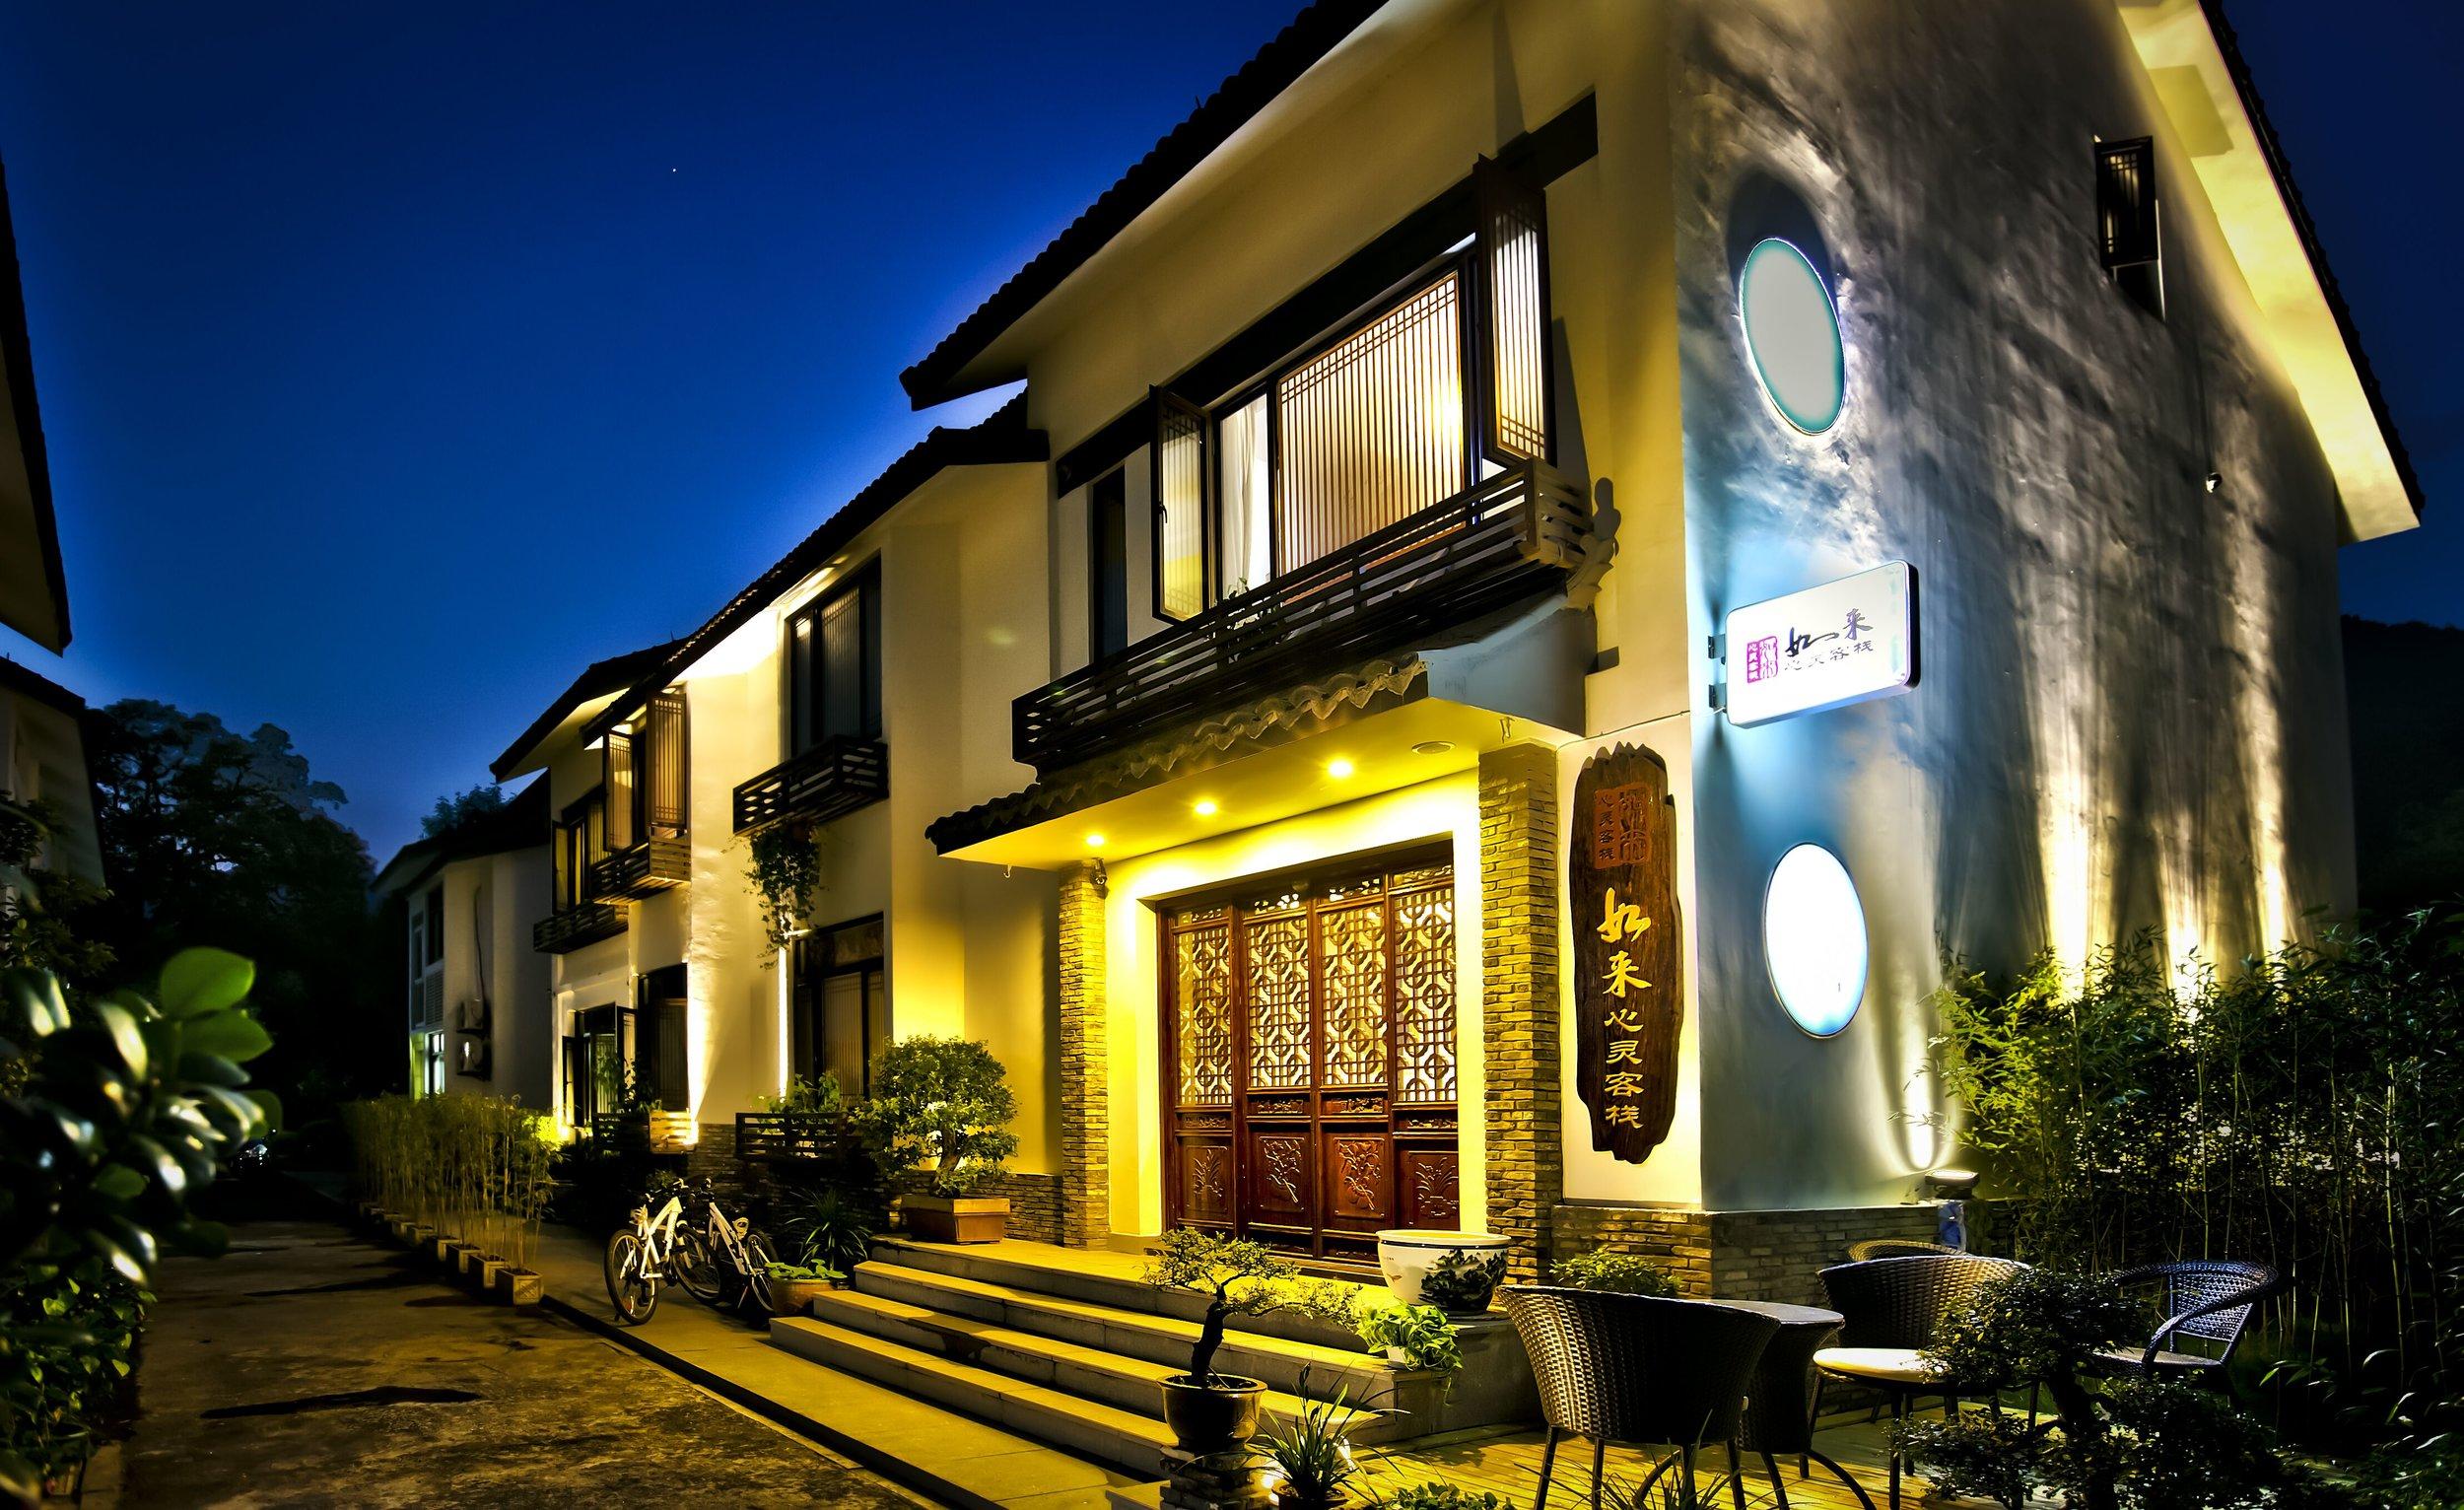 Hang Zhou 161 West Lake Villa Hotel -